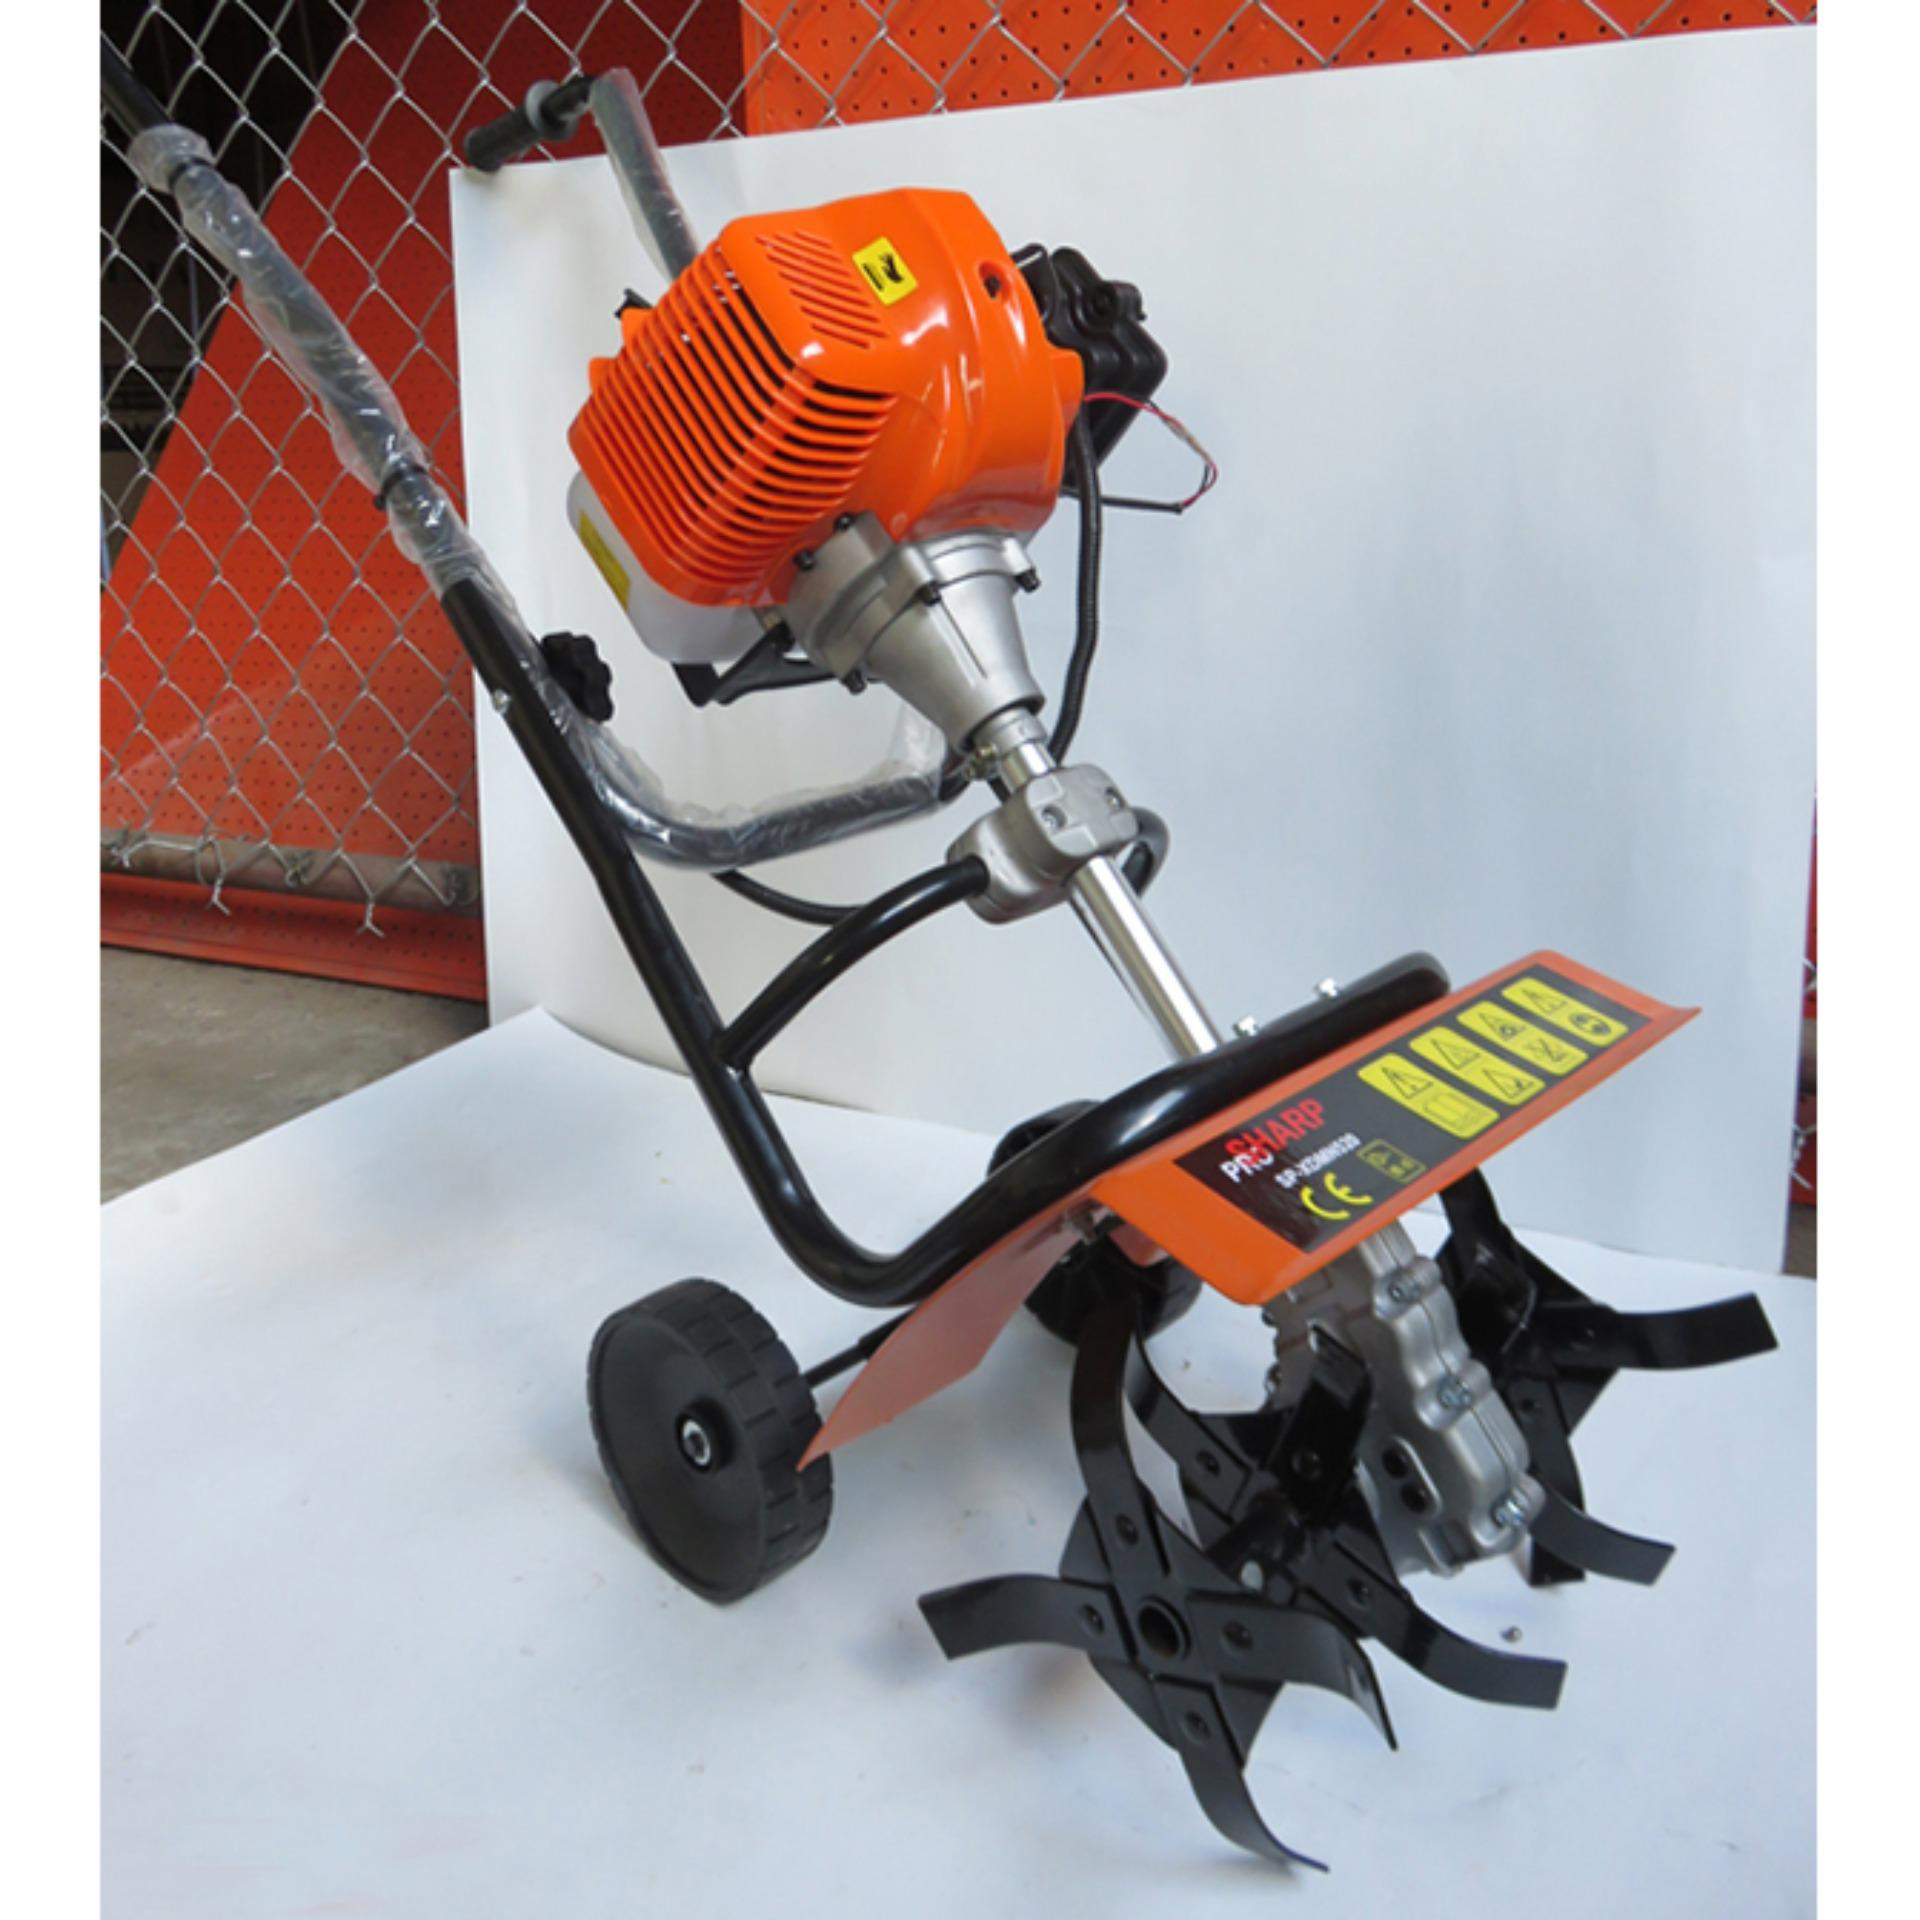 Máy xới đất cầm tay mini SHARP SP-XDMN520 (0.5ha/h)